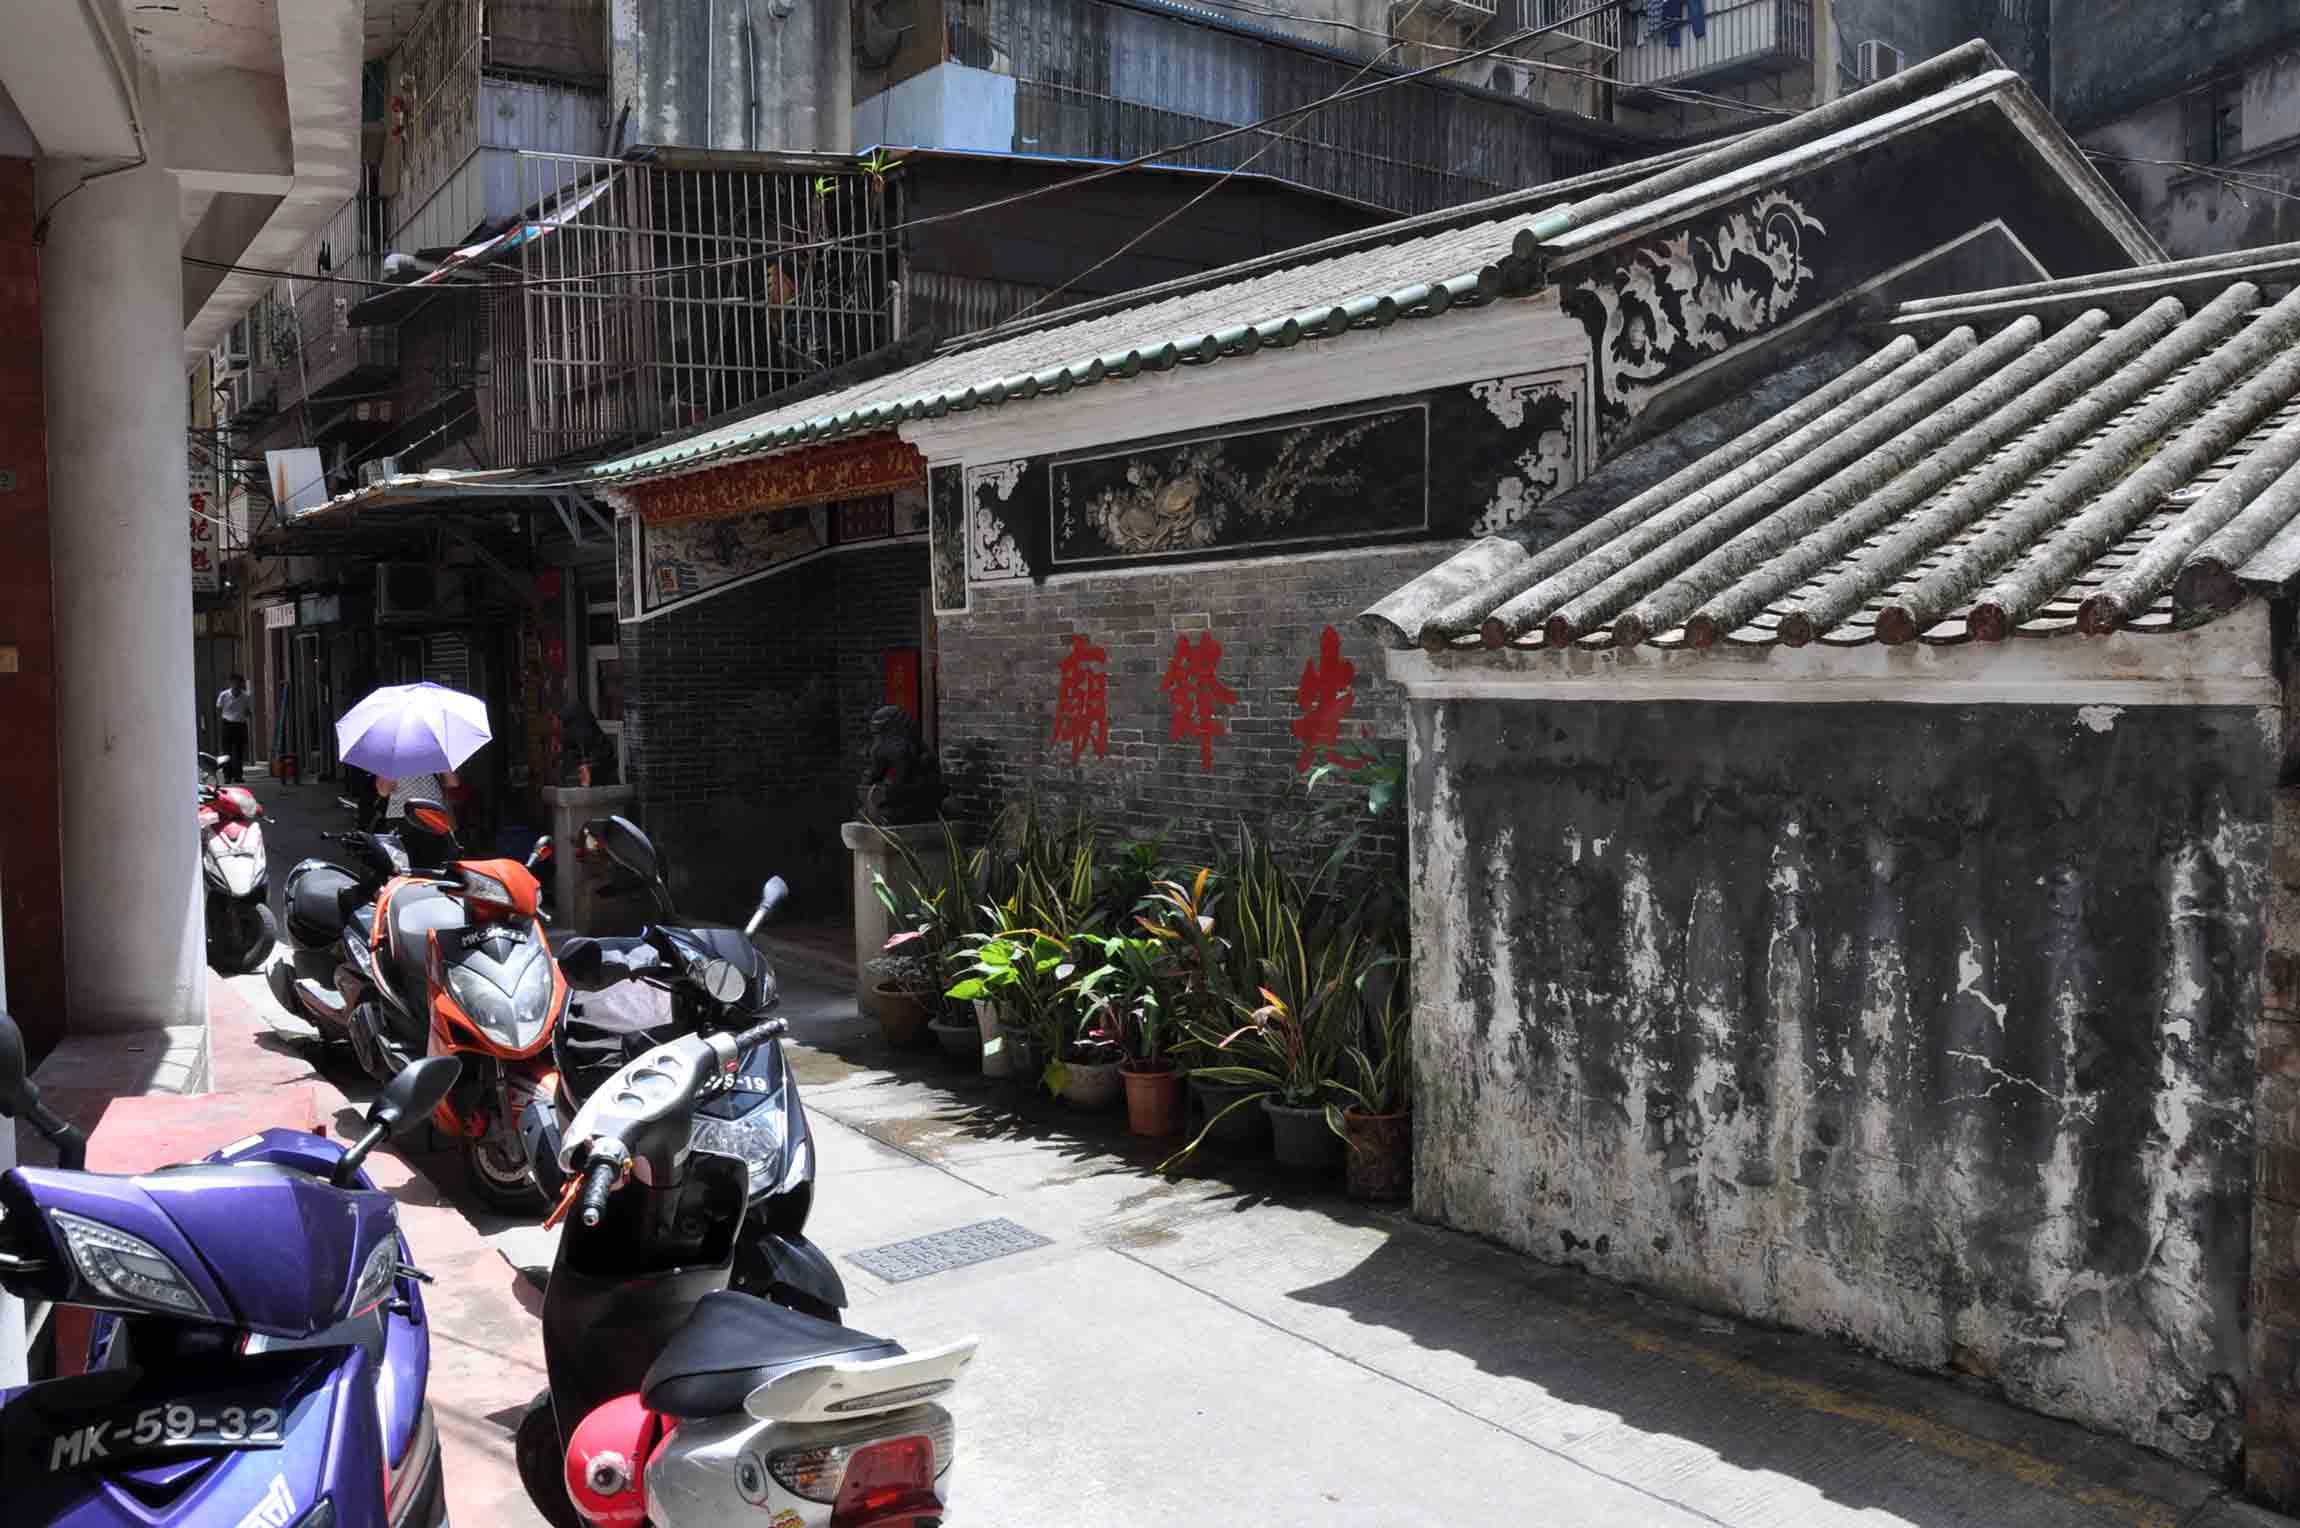 Macau temples: Temple of the Immortal Vanguard